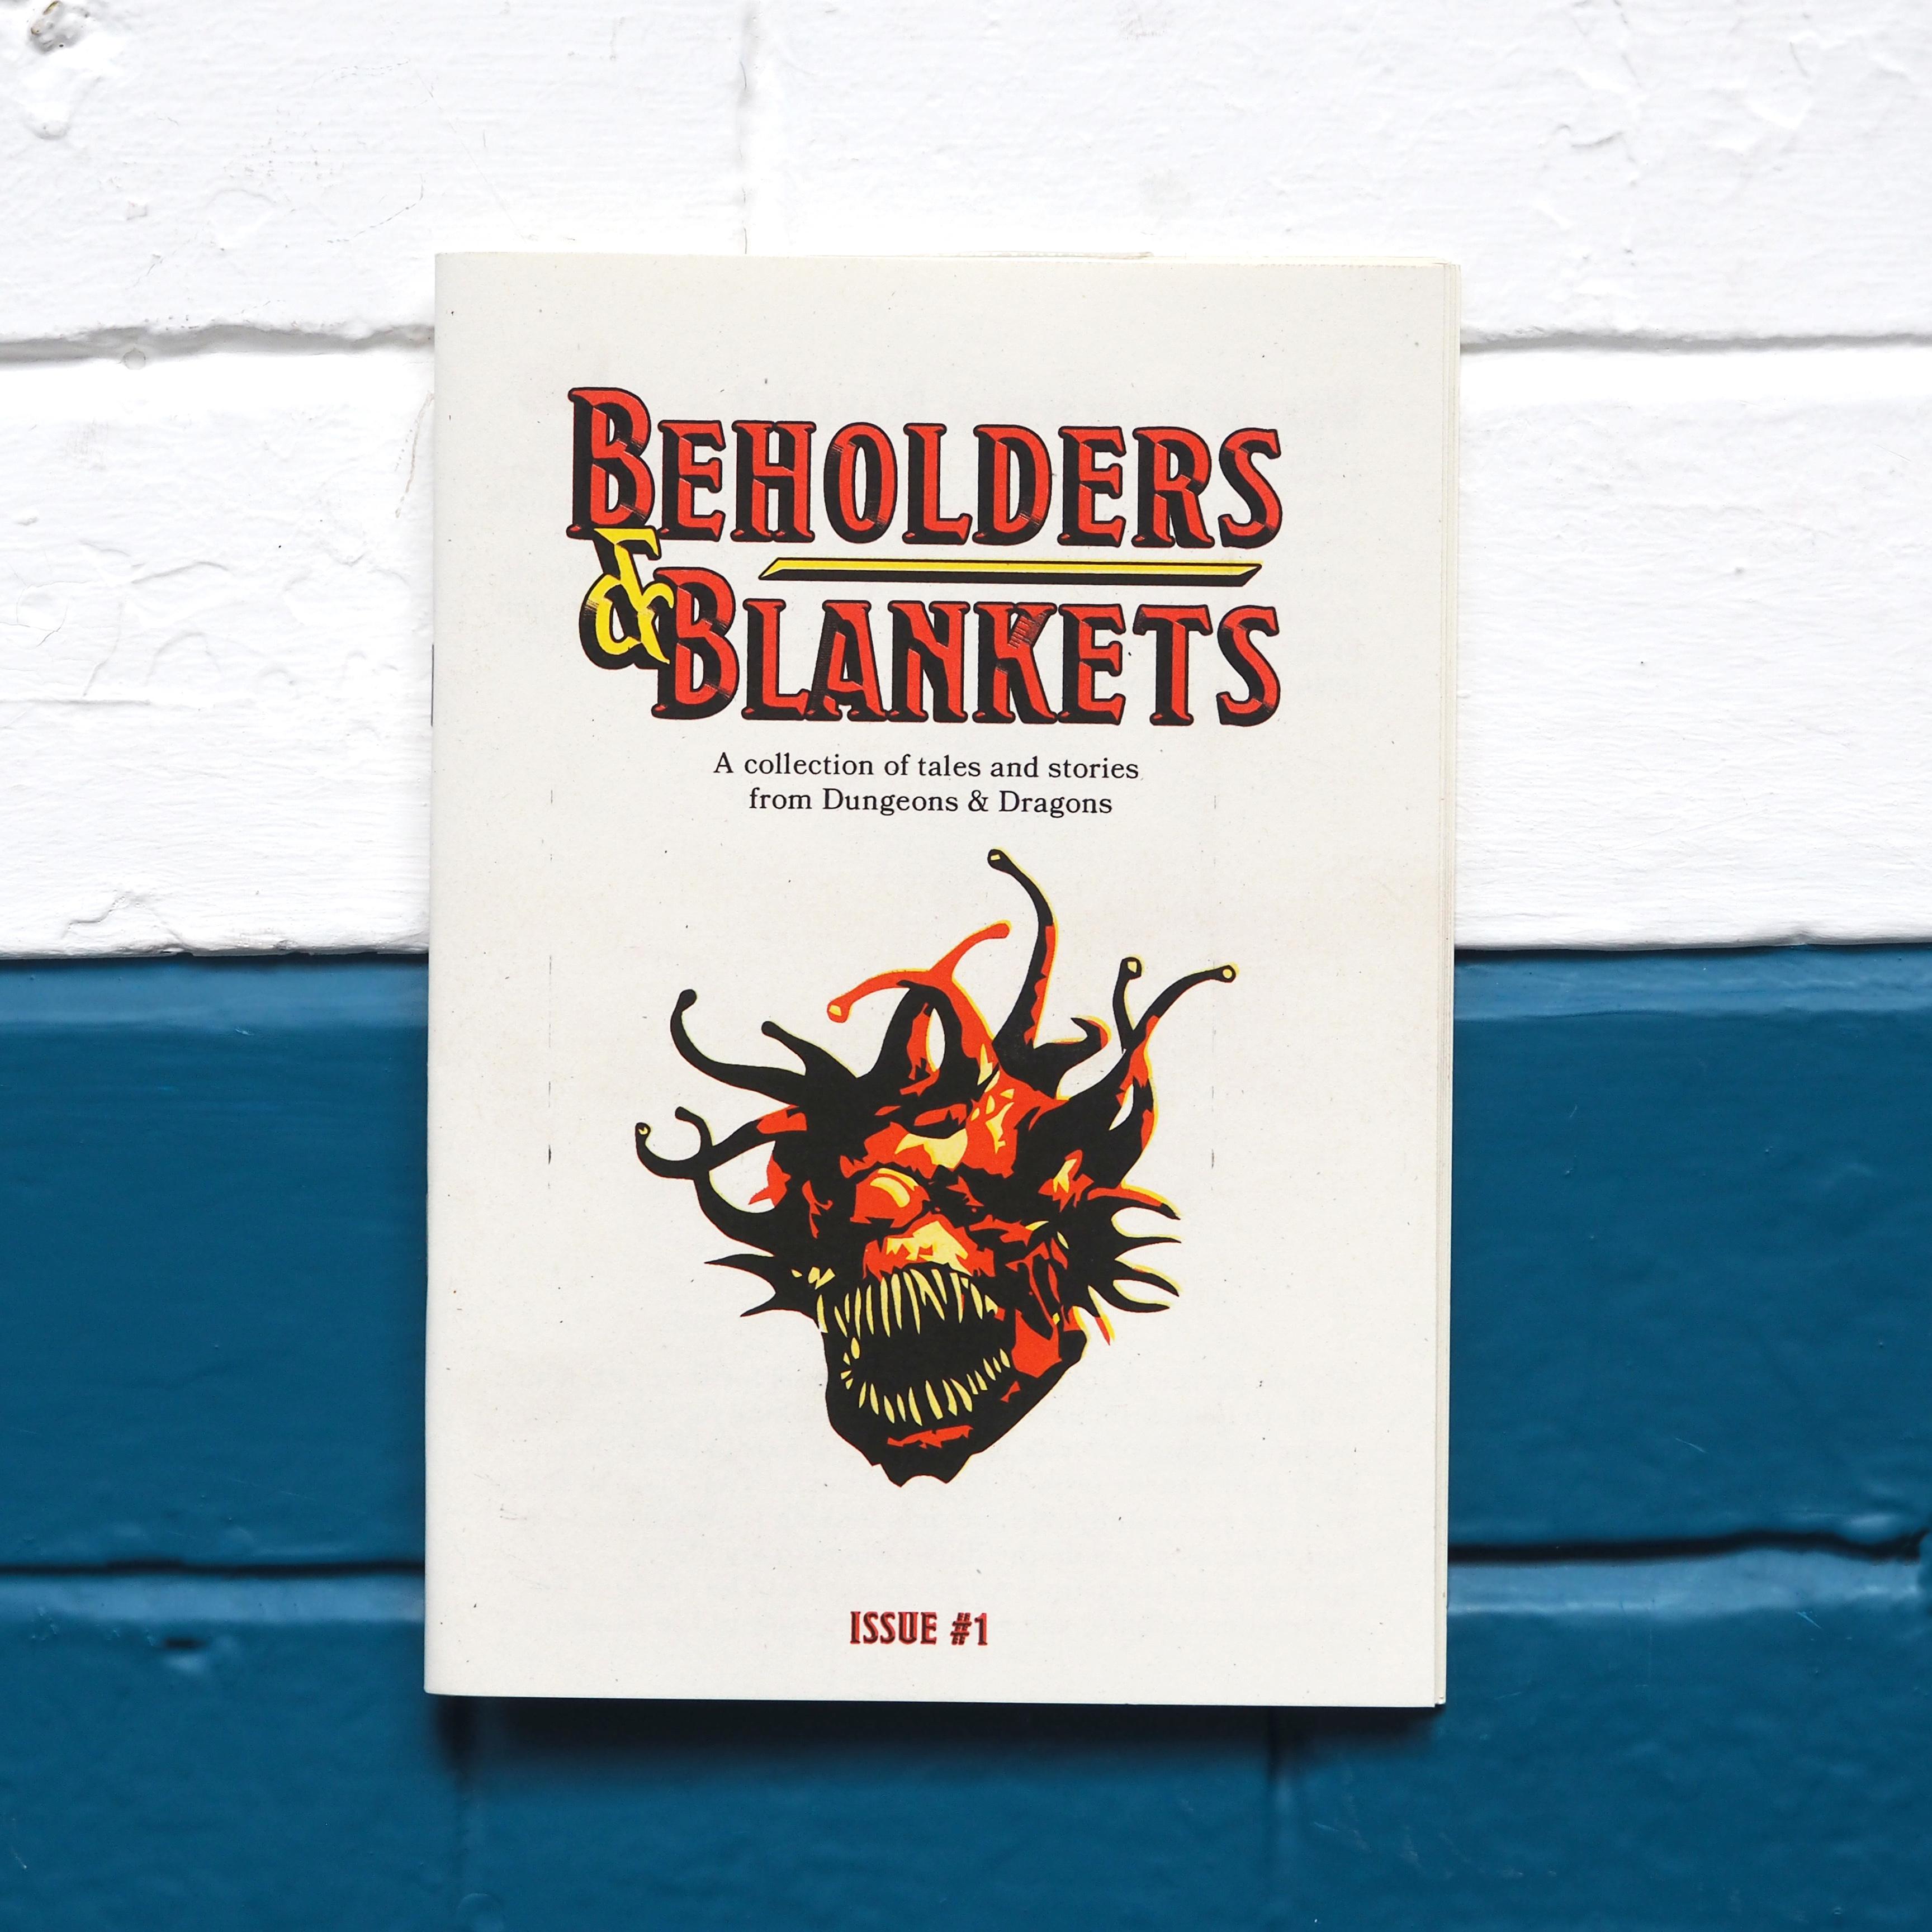 Beholders and Blankets - Jack Salvona